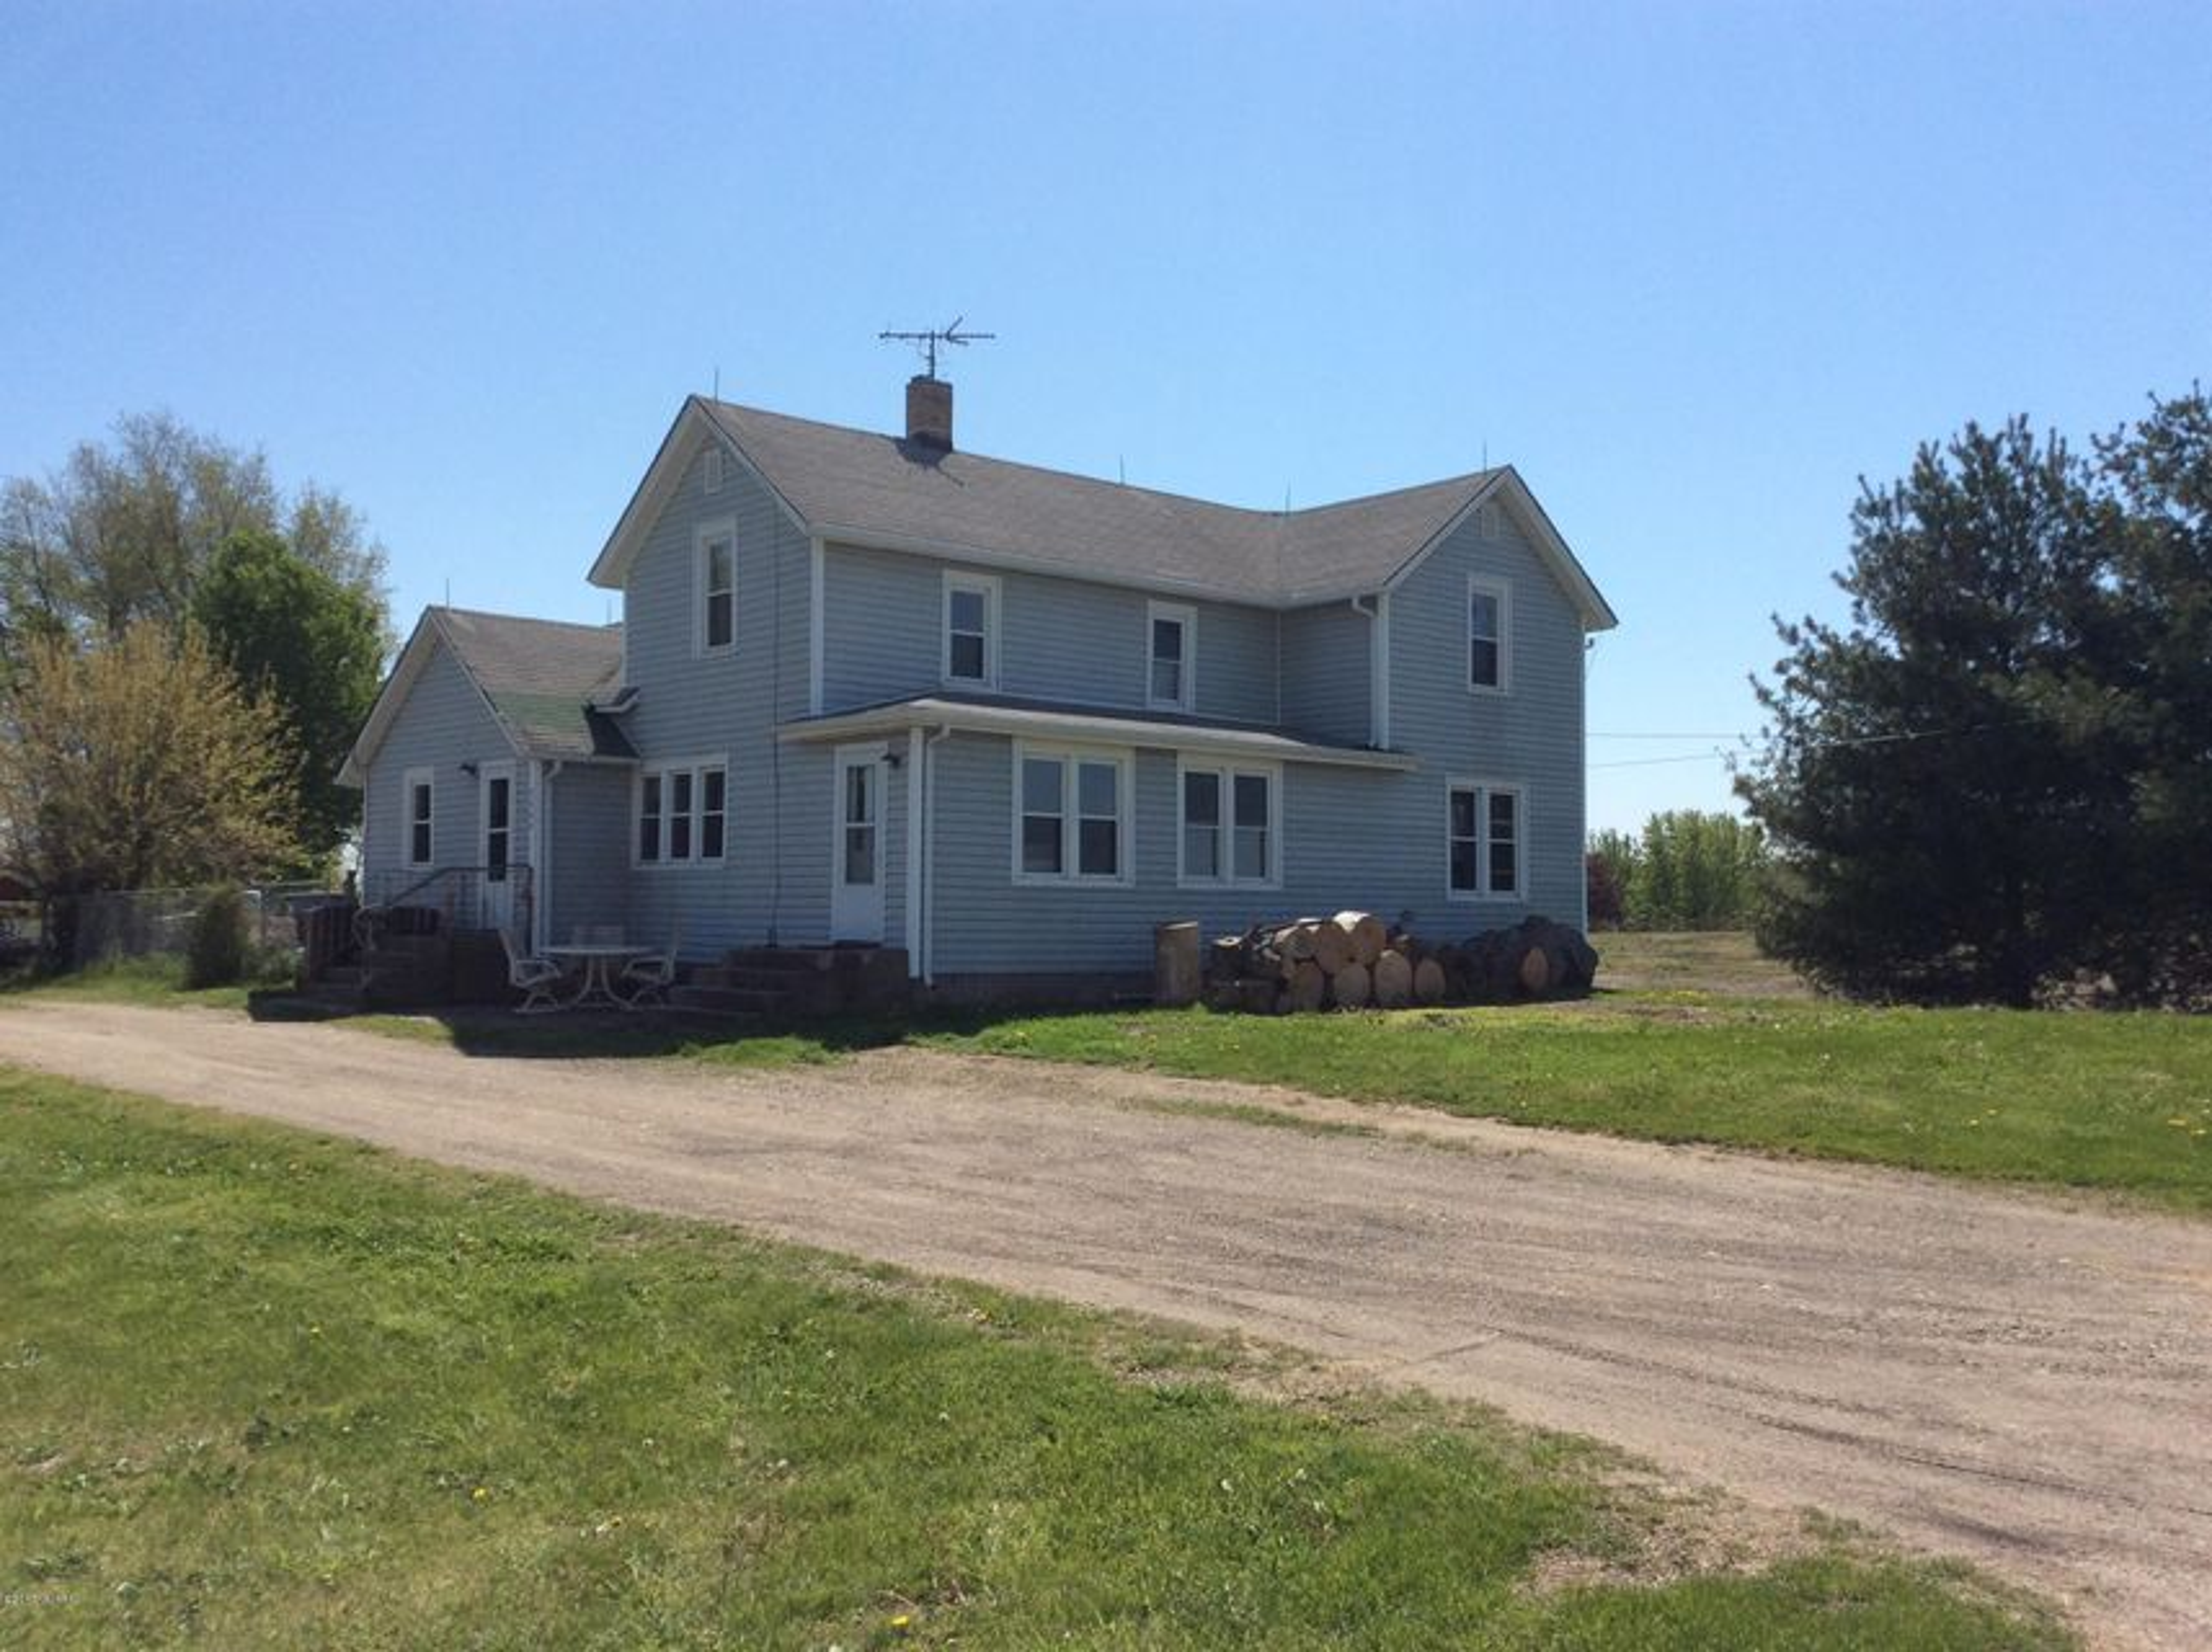 Farm / Ranch / Plantation for Sale at 2576 Lemon Creek 2576 Lemon Creek Berrien Springs, Michigan 49103 United States